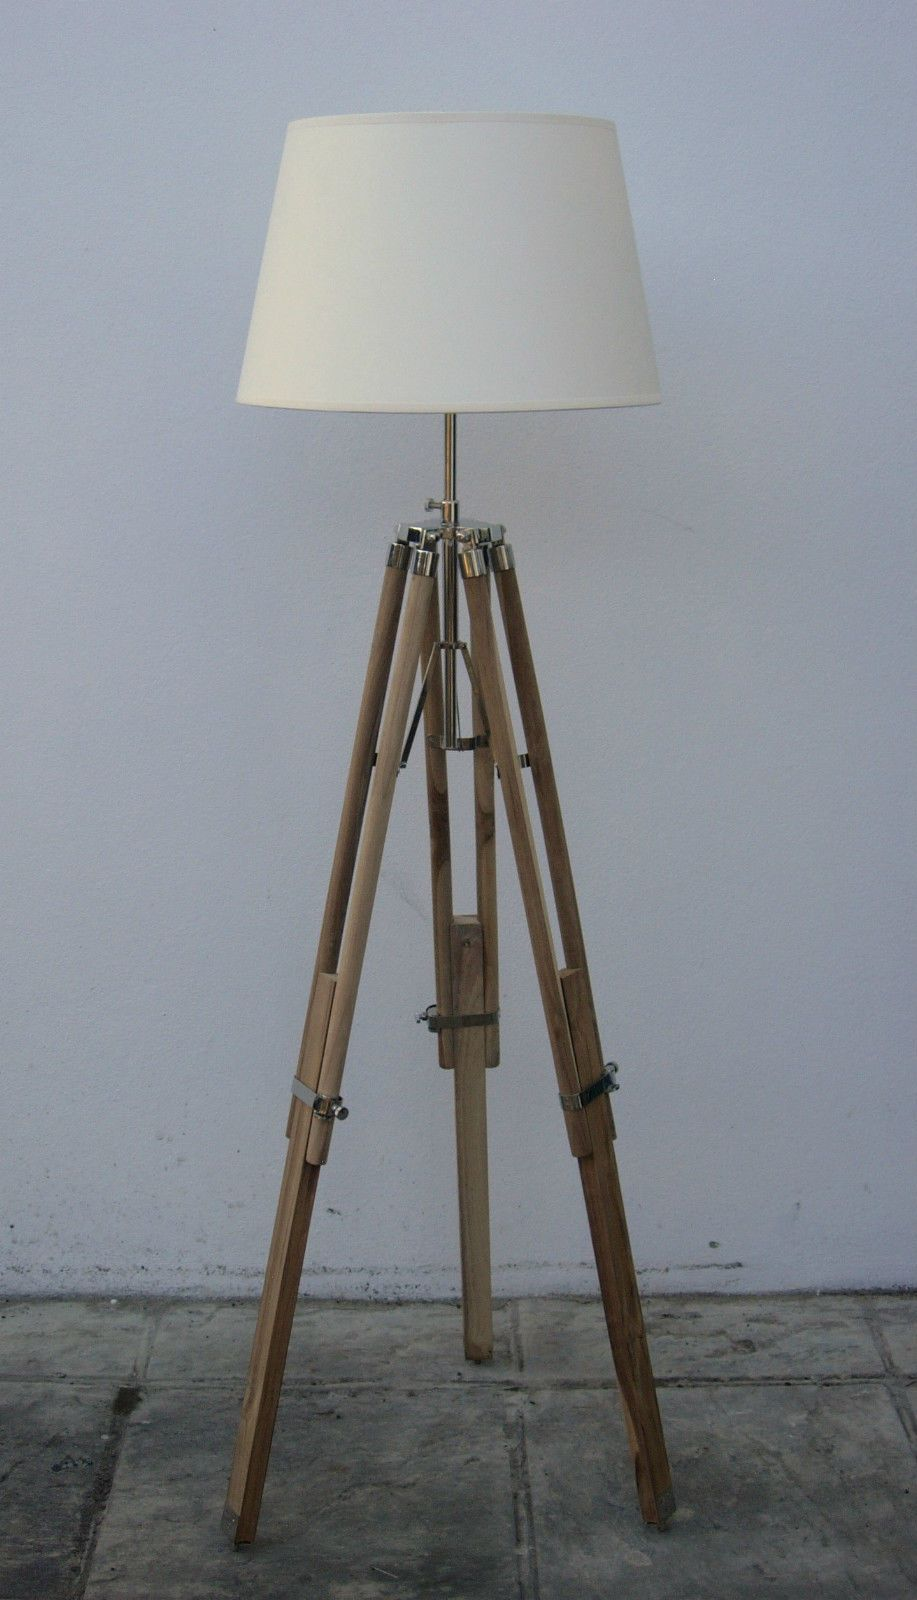 Modern Tripod Light Standard Floor Lamp Without Shade Standard